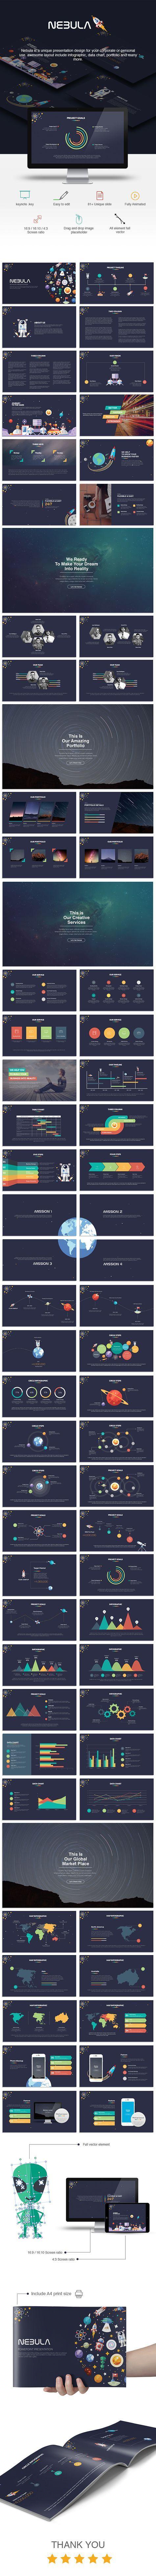 Nebula Keynote Presentation Template #design #slides Download: http://graphicriver.net/item/nebula-keynote-presentation/13816962?ref=ksioks